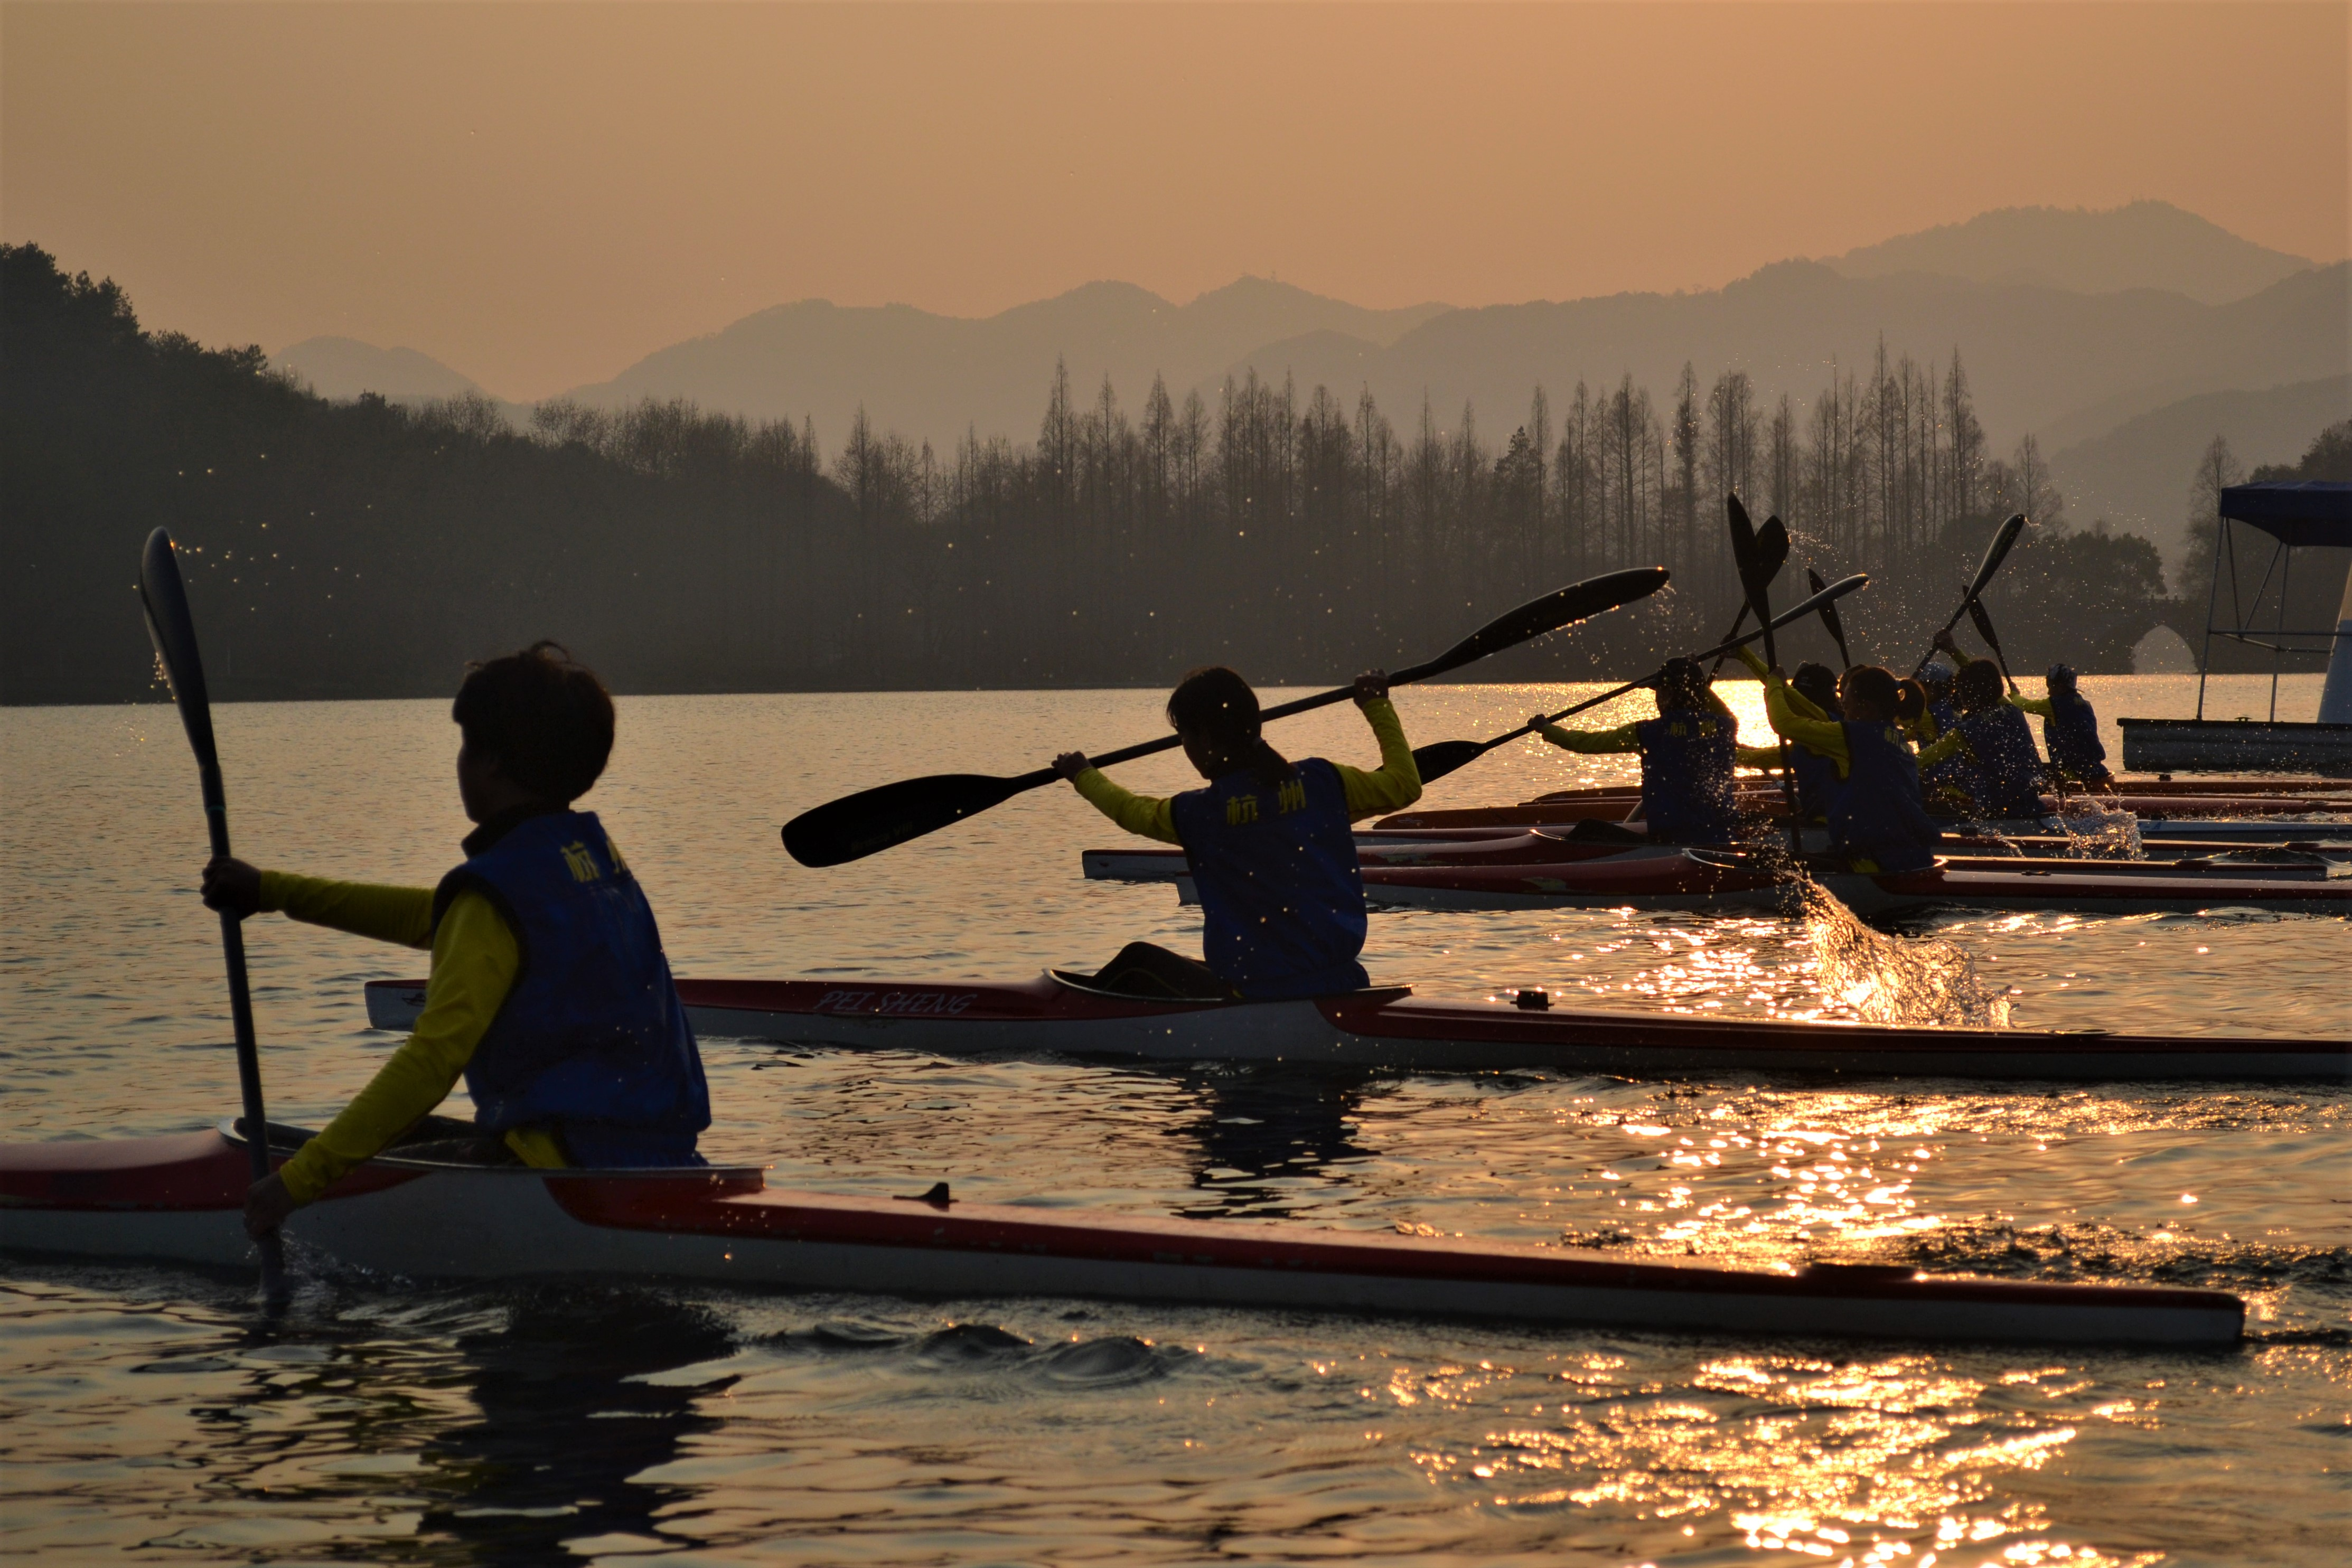 Kayaking on West Lake | ©Rachel Deason